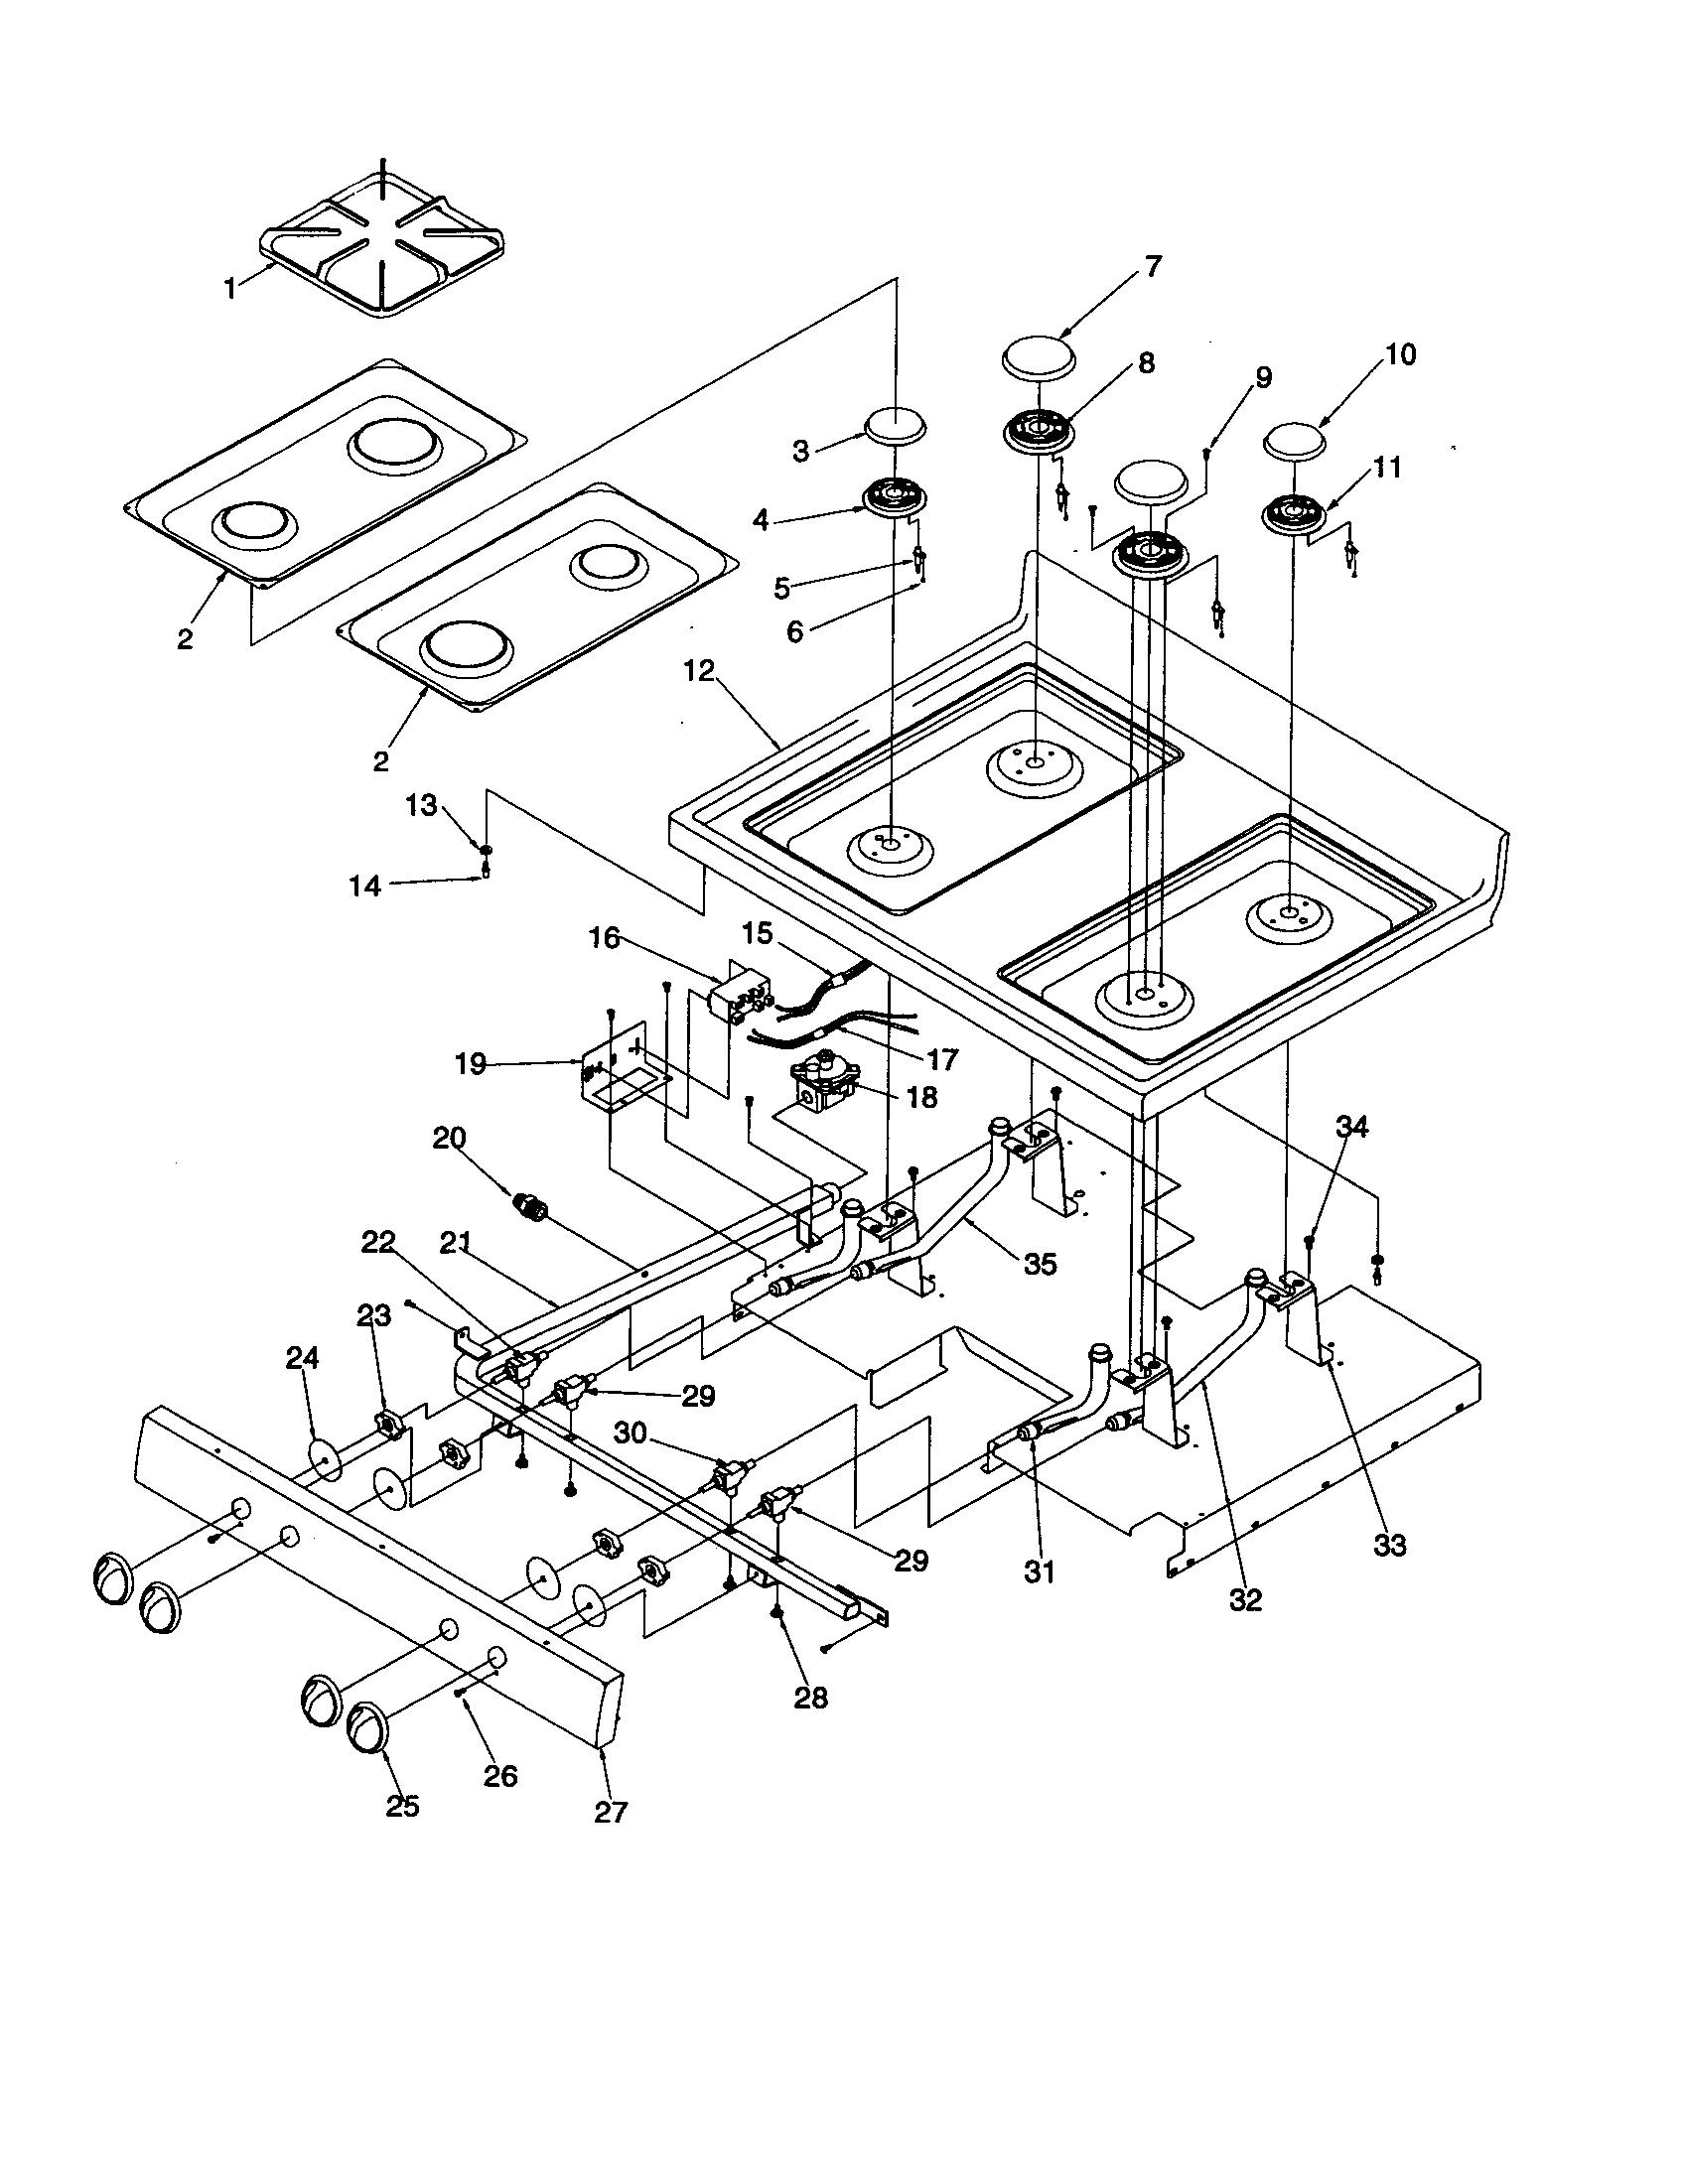 hight resolution of arg7600ww amana arg7600ww timer clock erc main top parts diagram